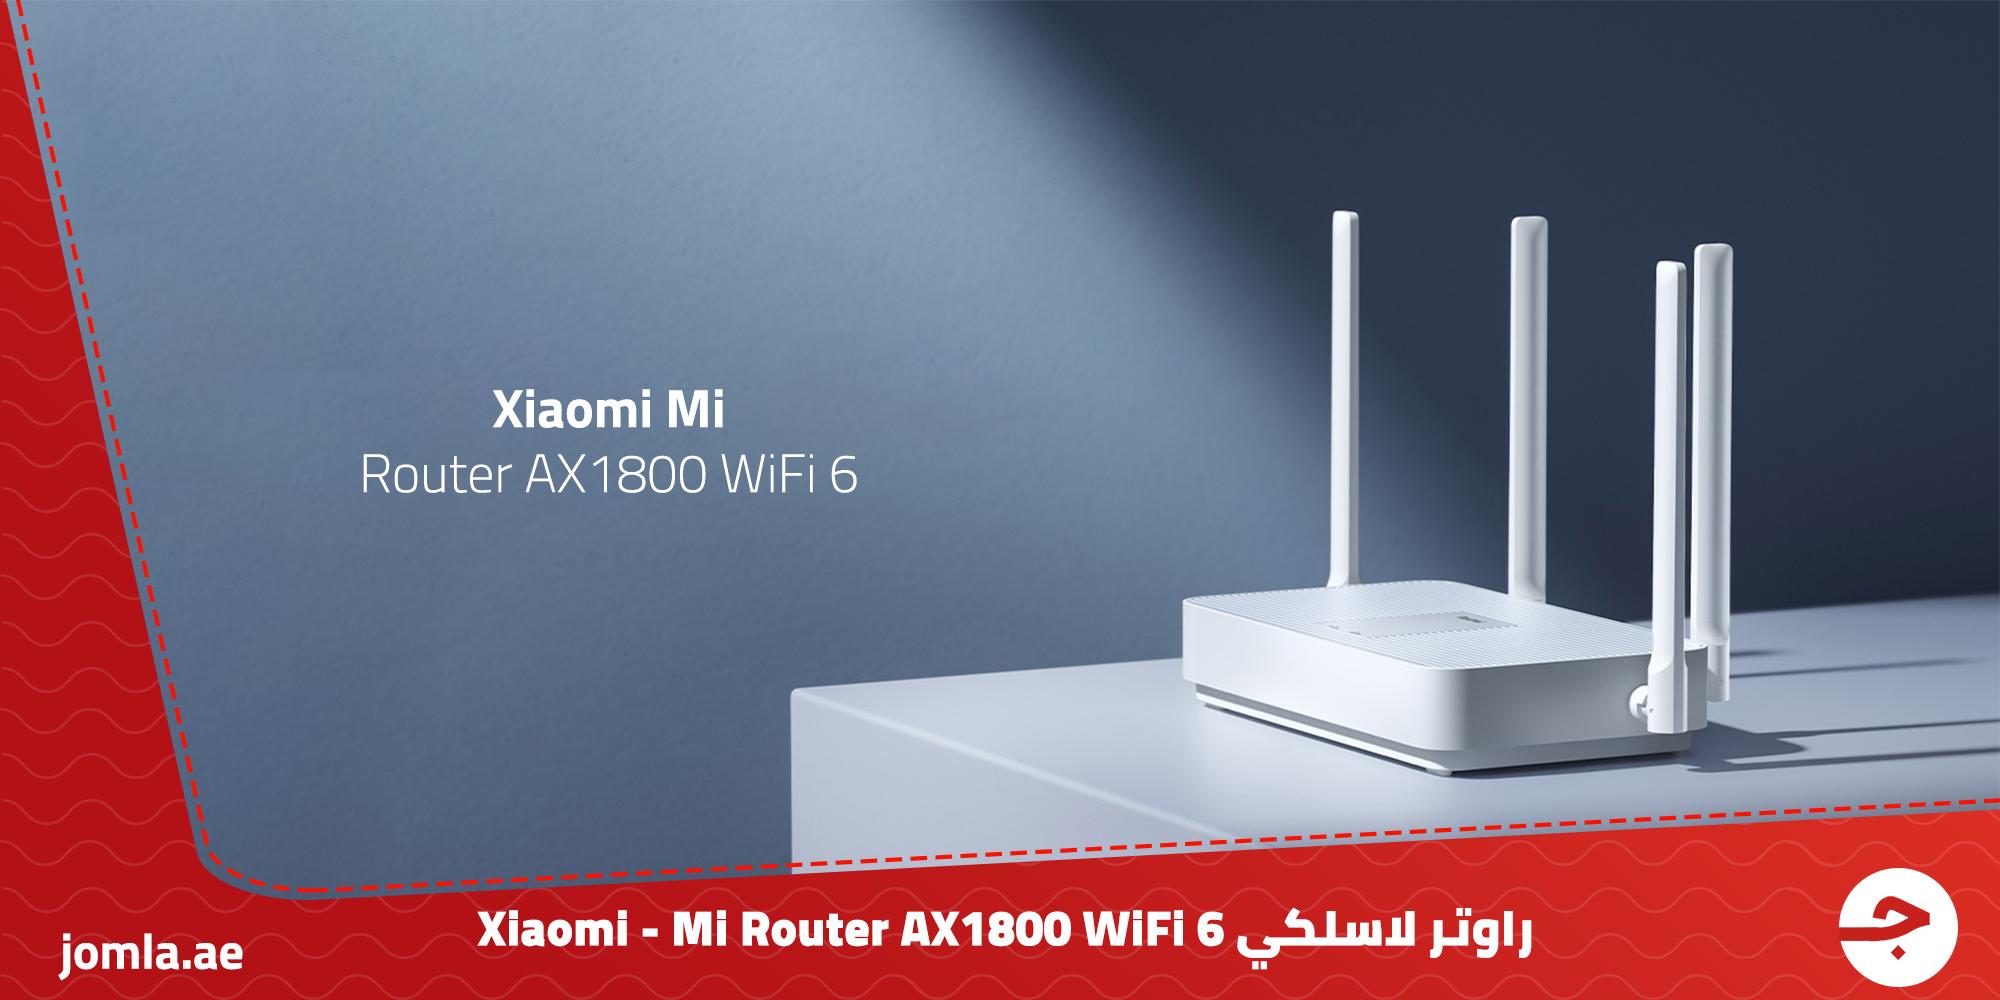 راوتر لاسلكي Xiaomi - Mi Router AX1800 WiFi 6